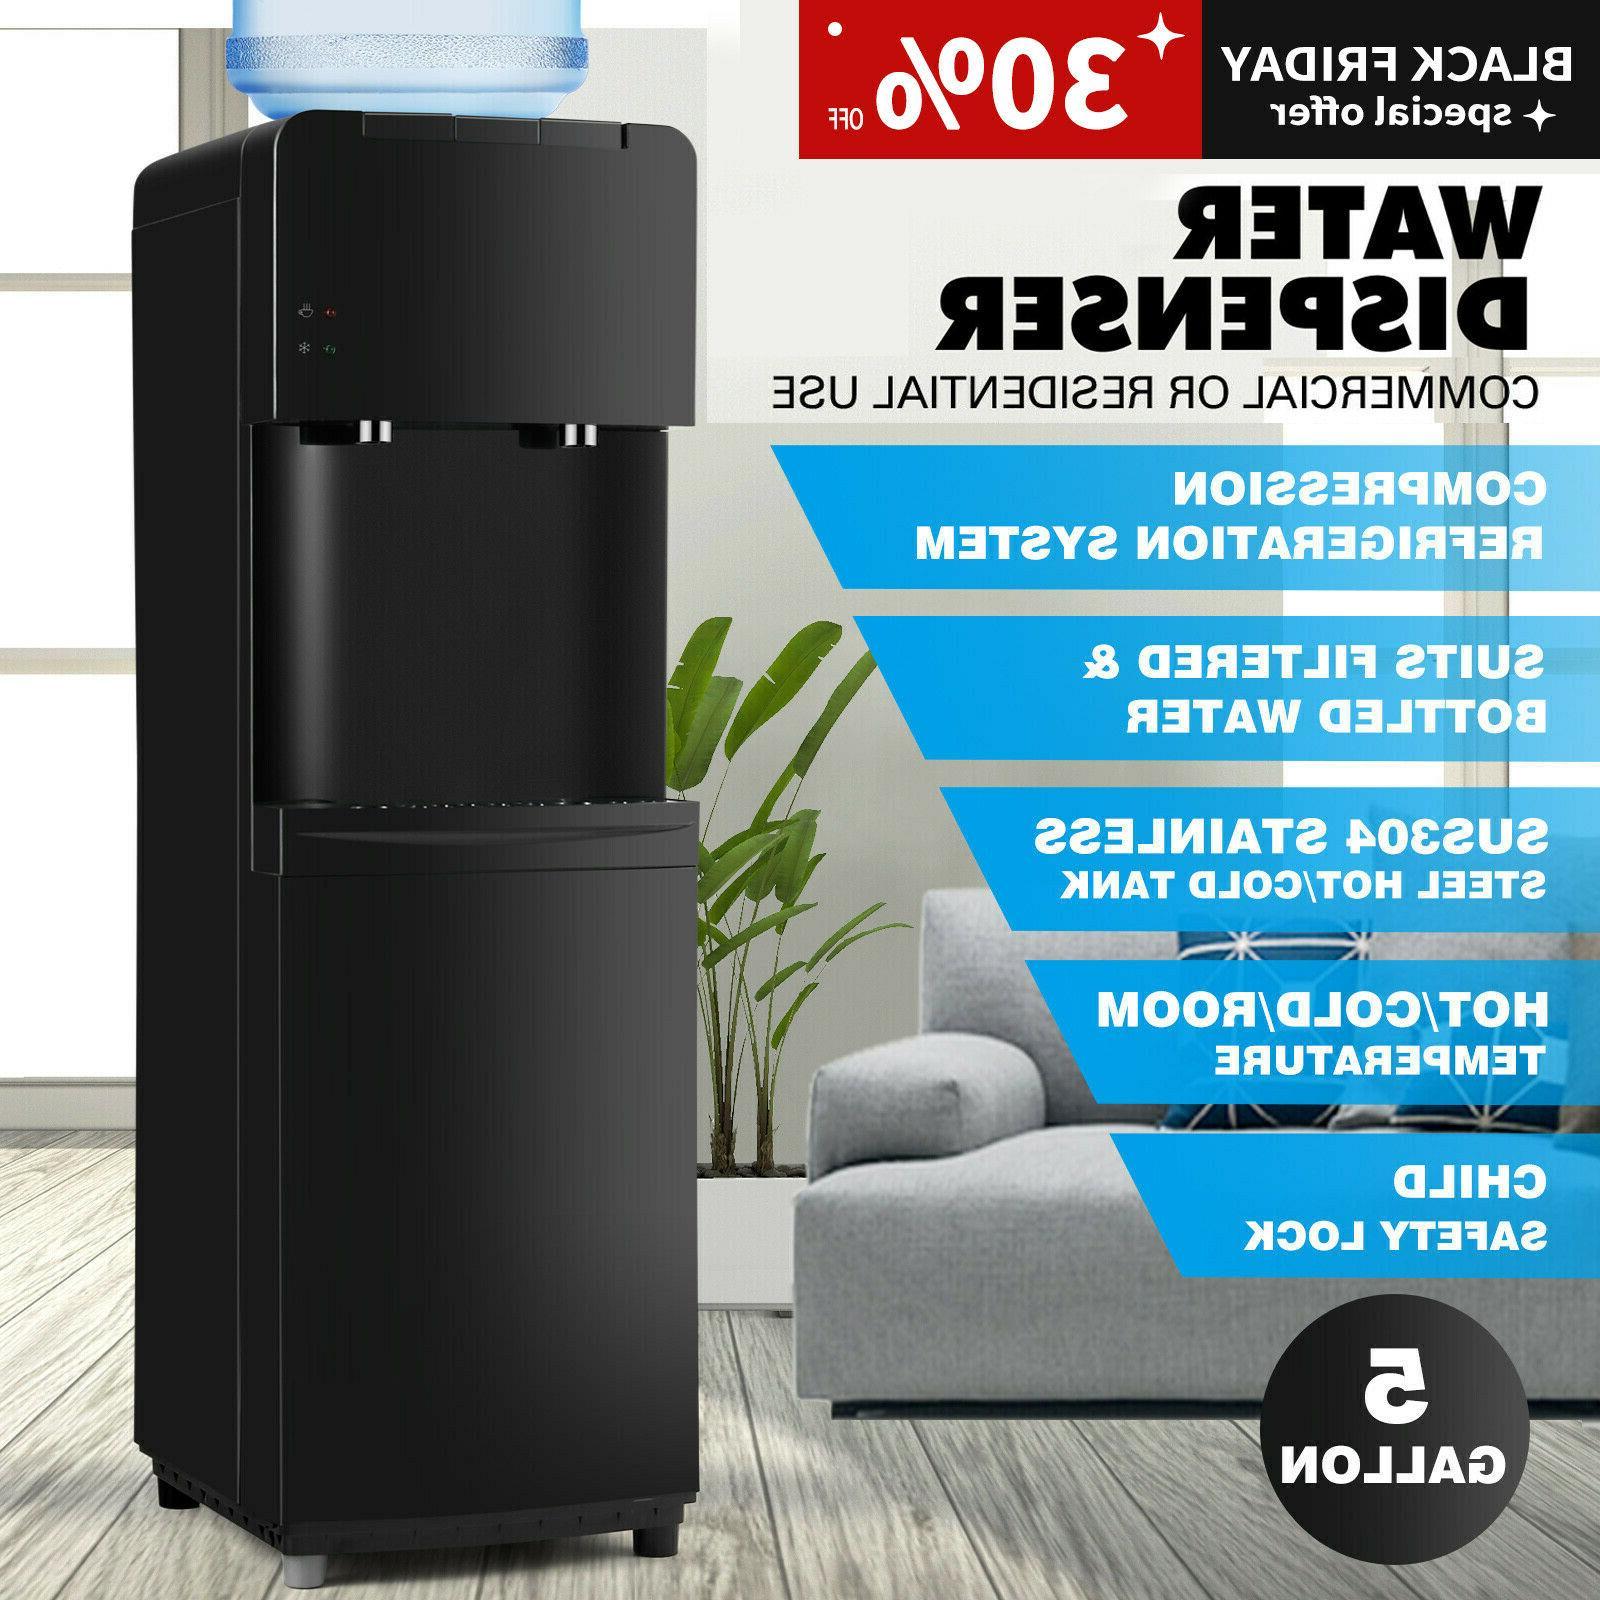 water cooler dispenser compressor cooling stainless steel